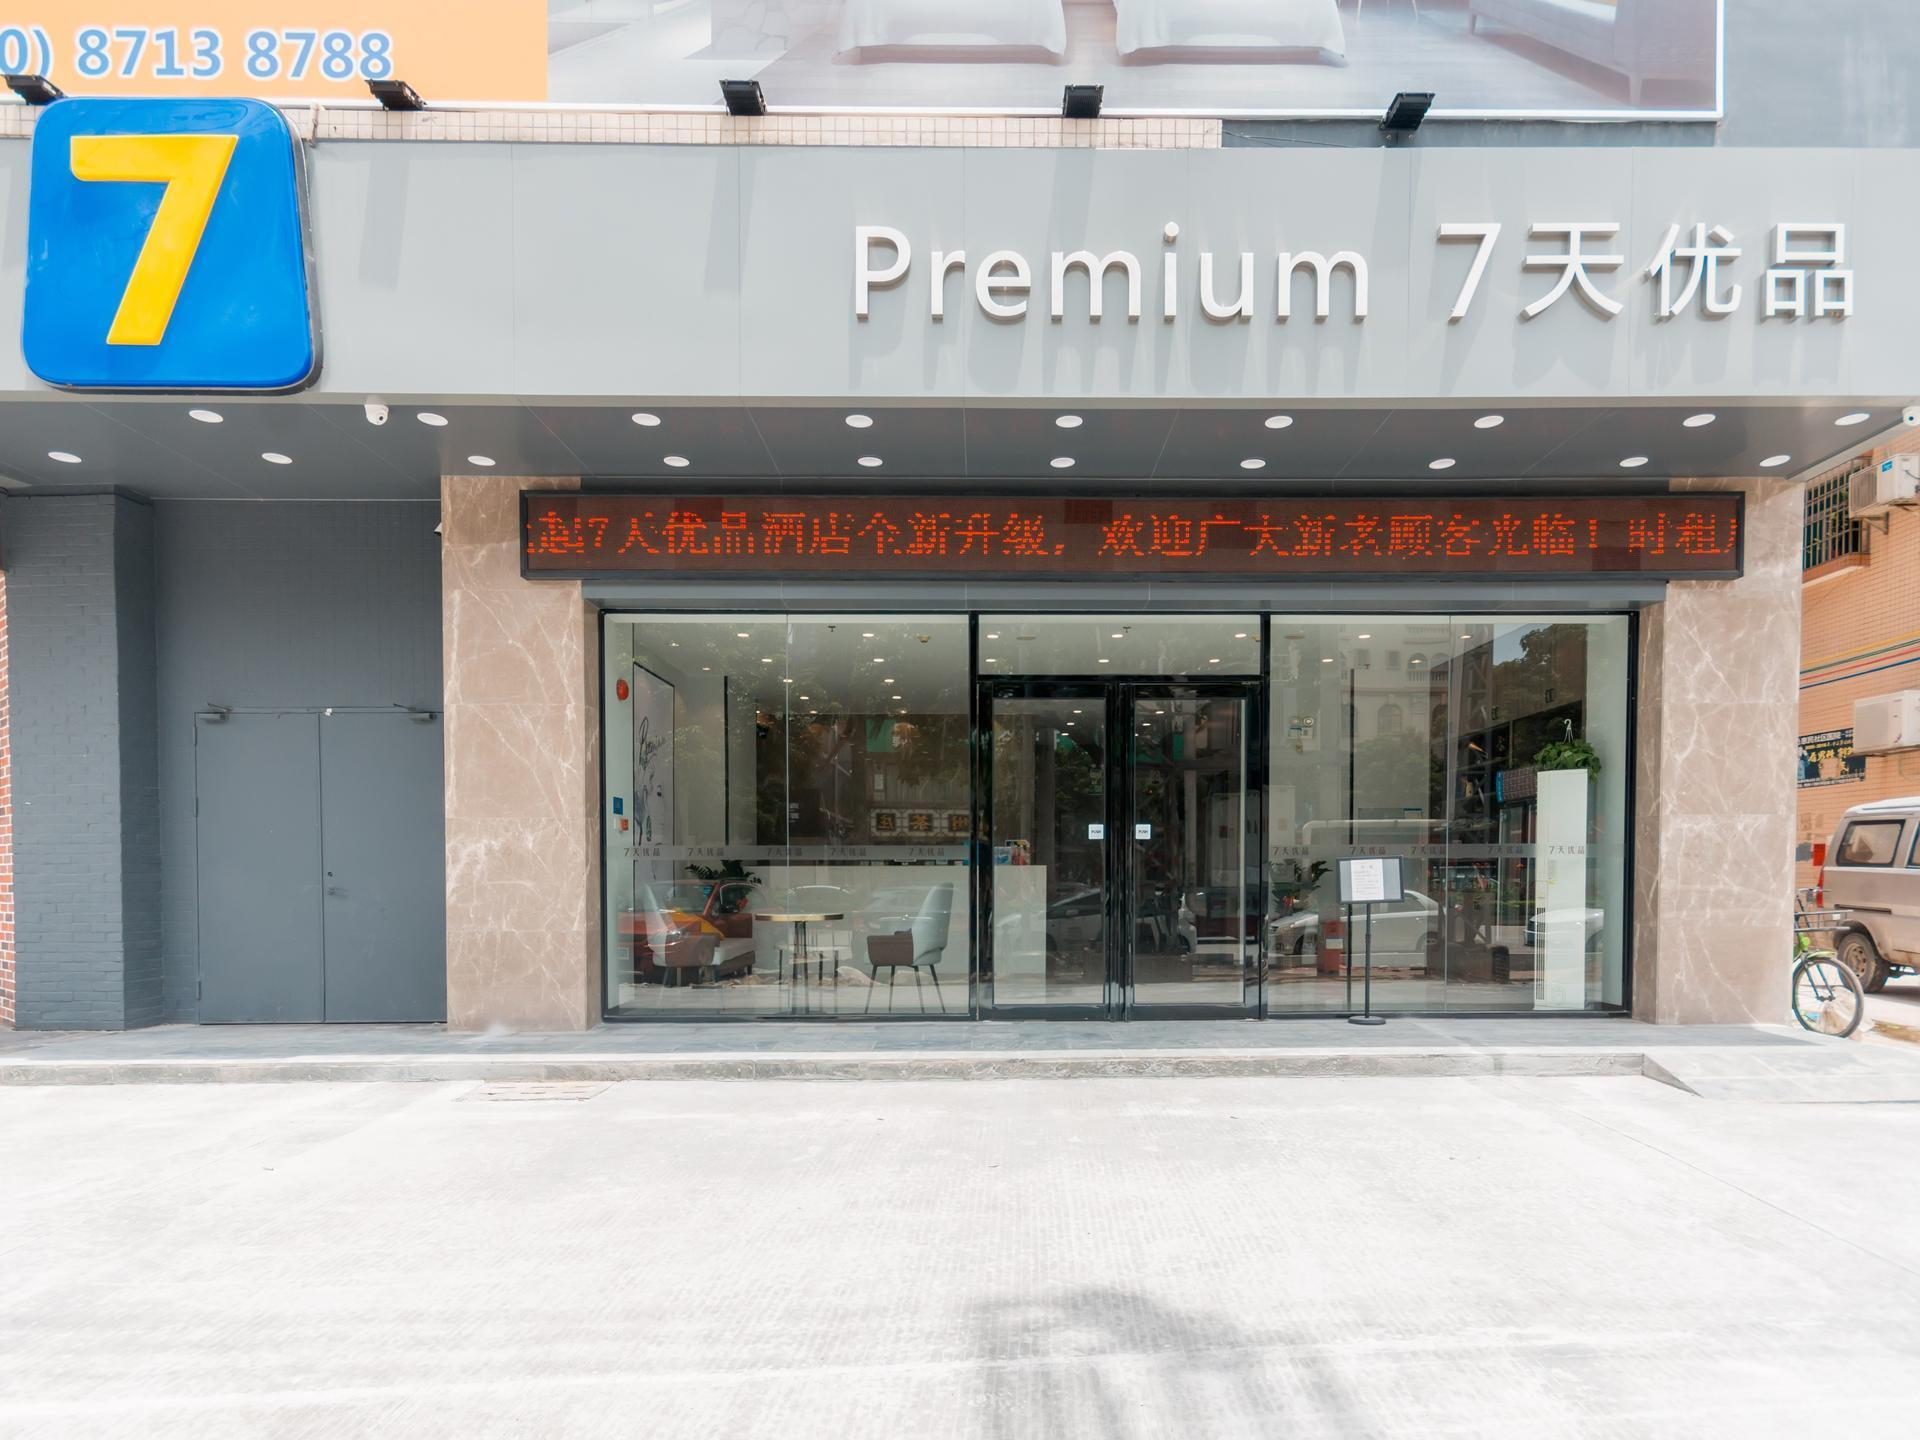 7 Days Premium�Zhongshan Tanzhou Market Centre